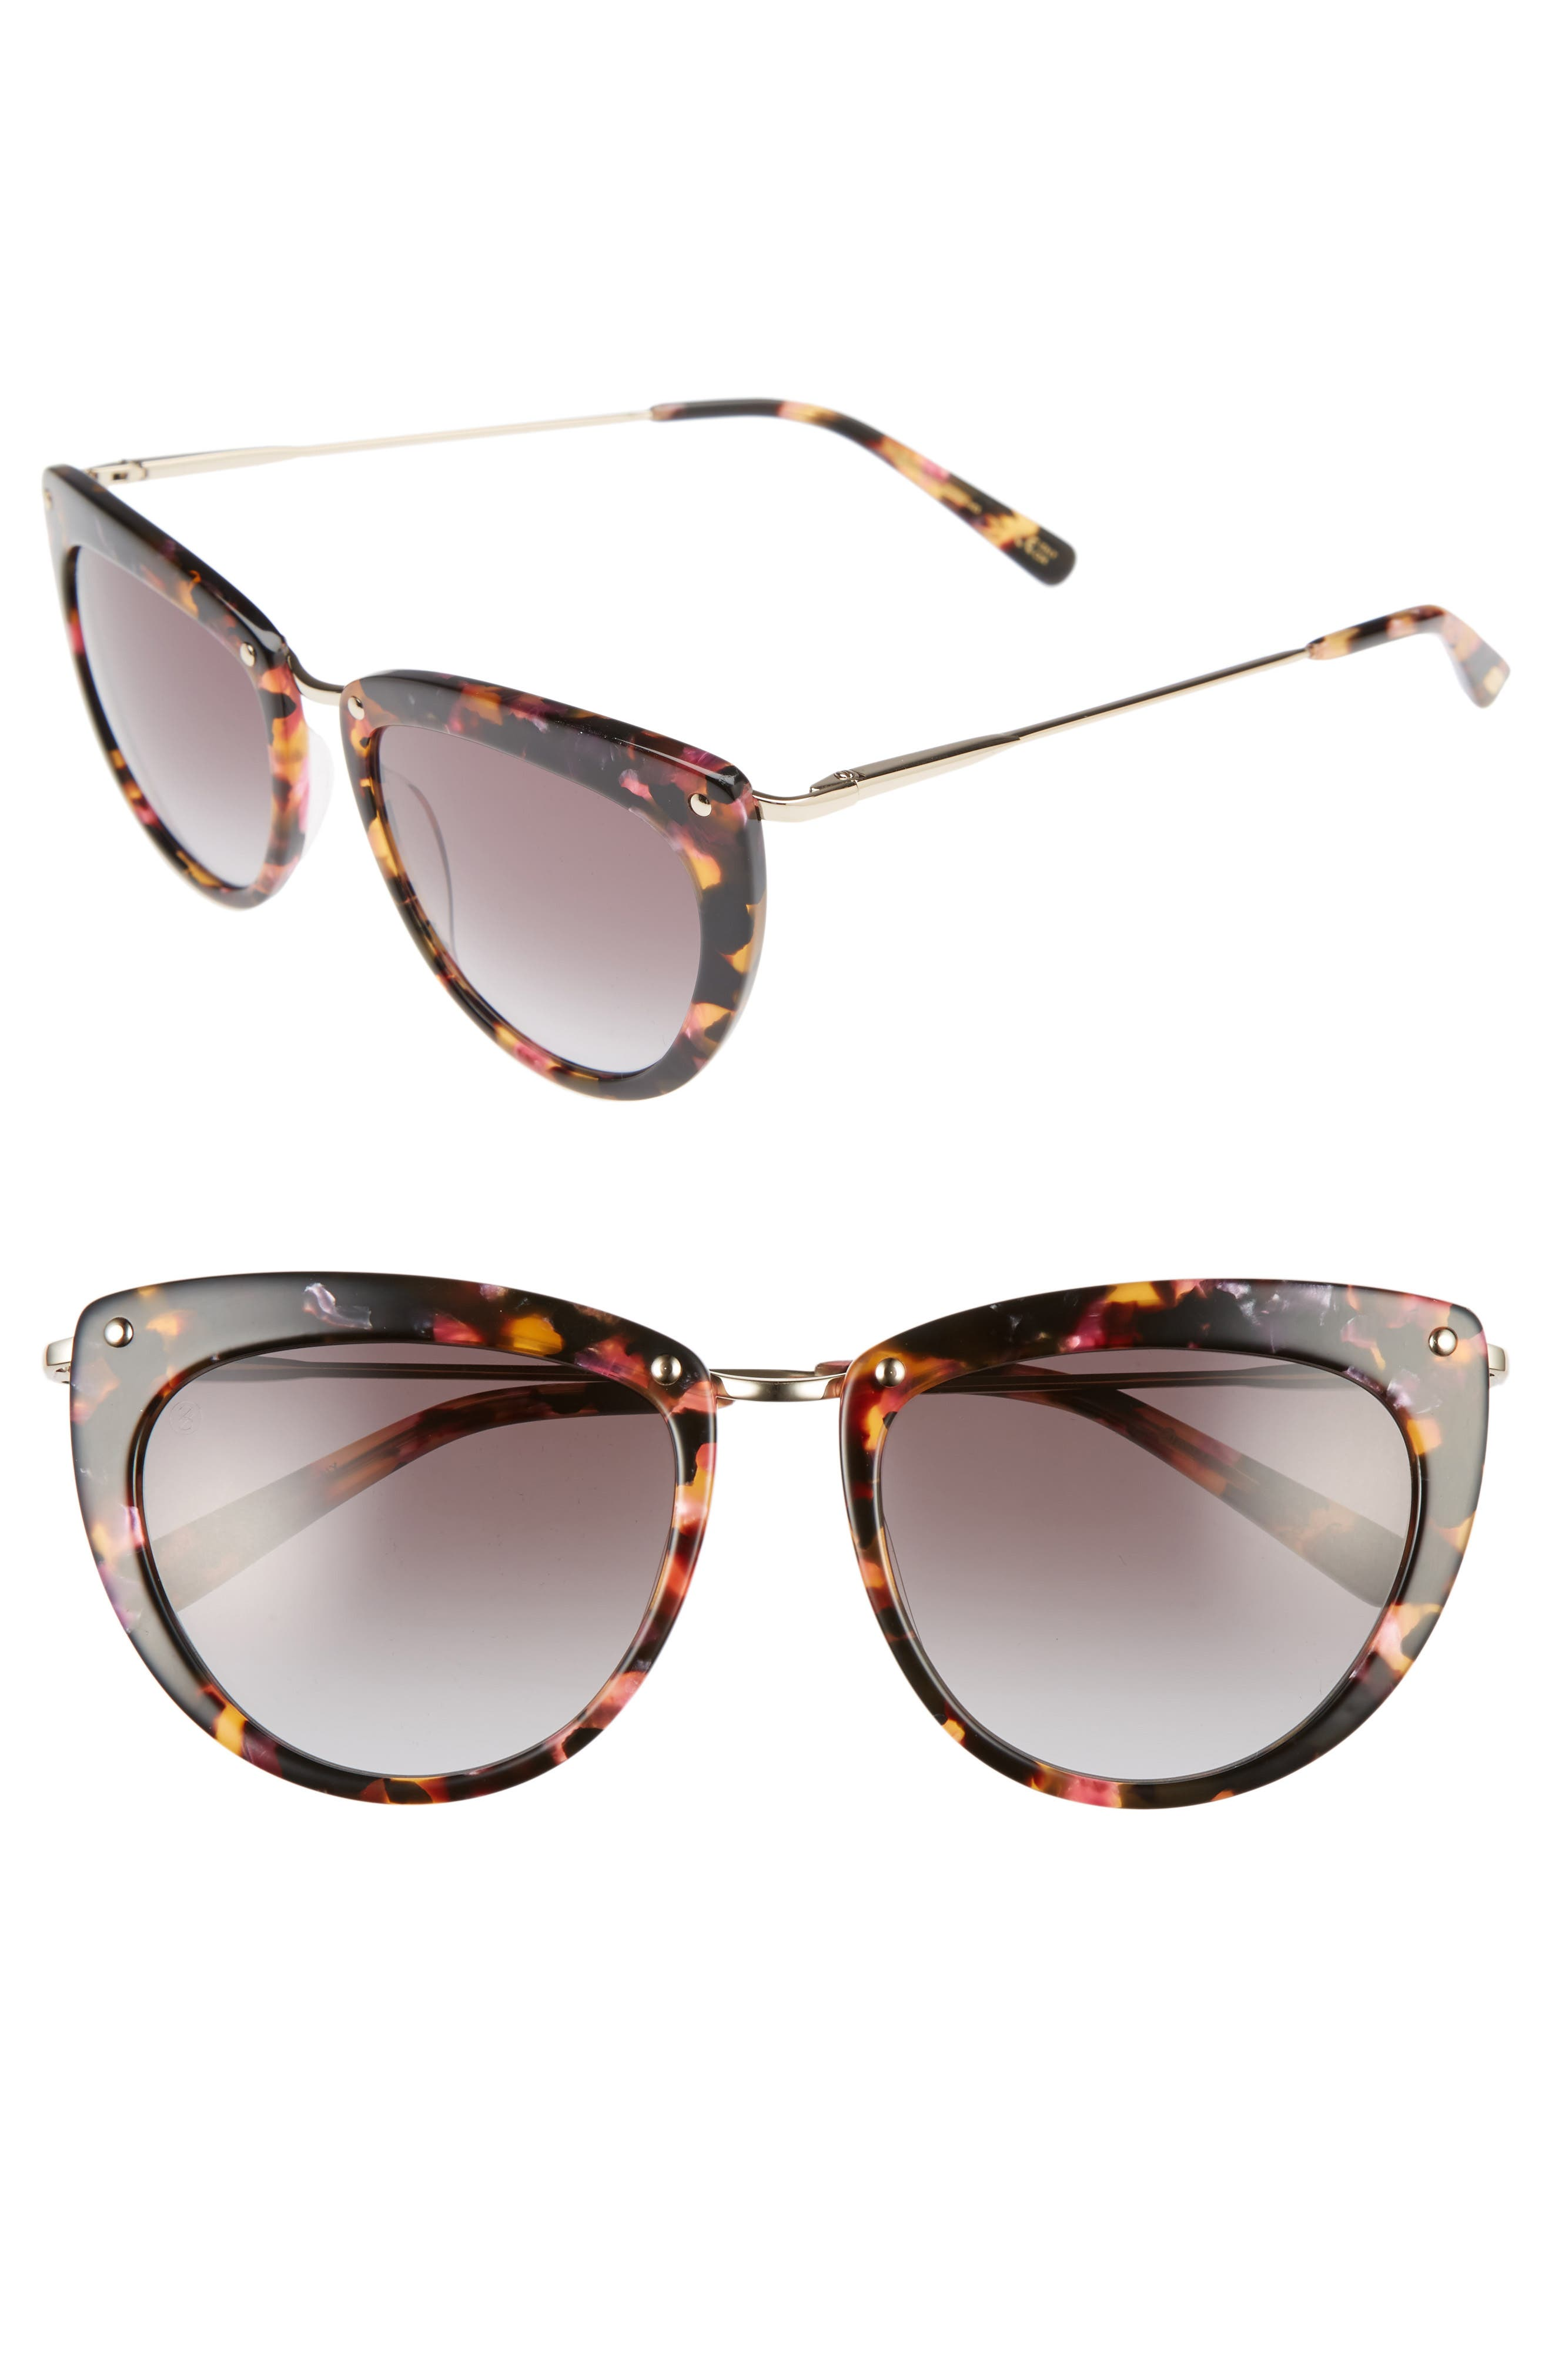 D'BLANC Tan Lines 52mm Gradient Cat Eye Sunglasses